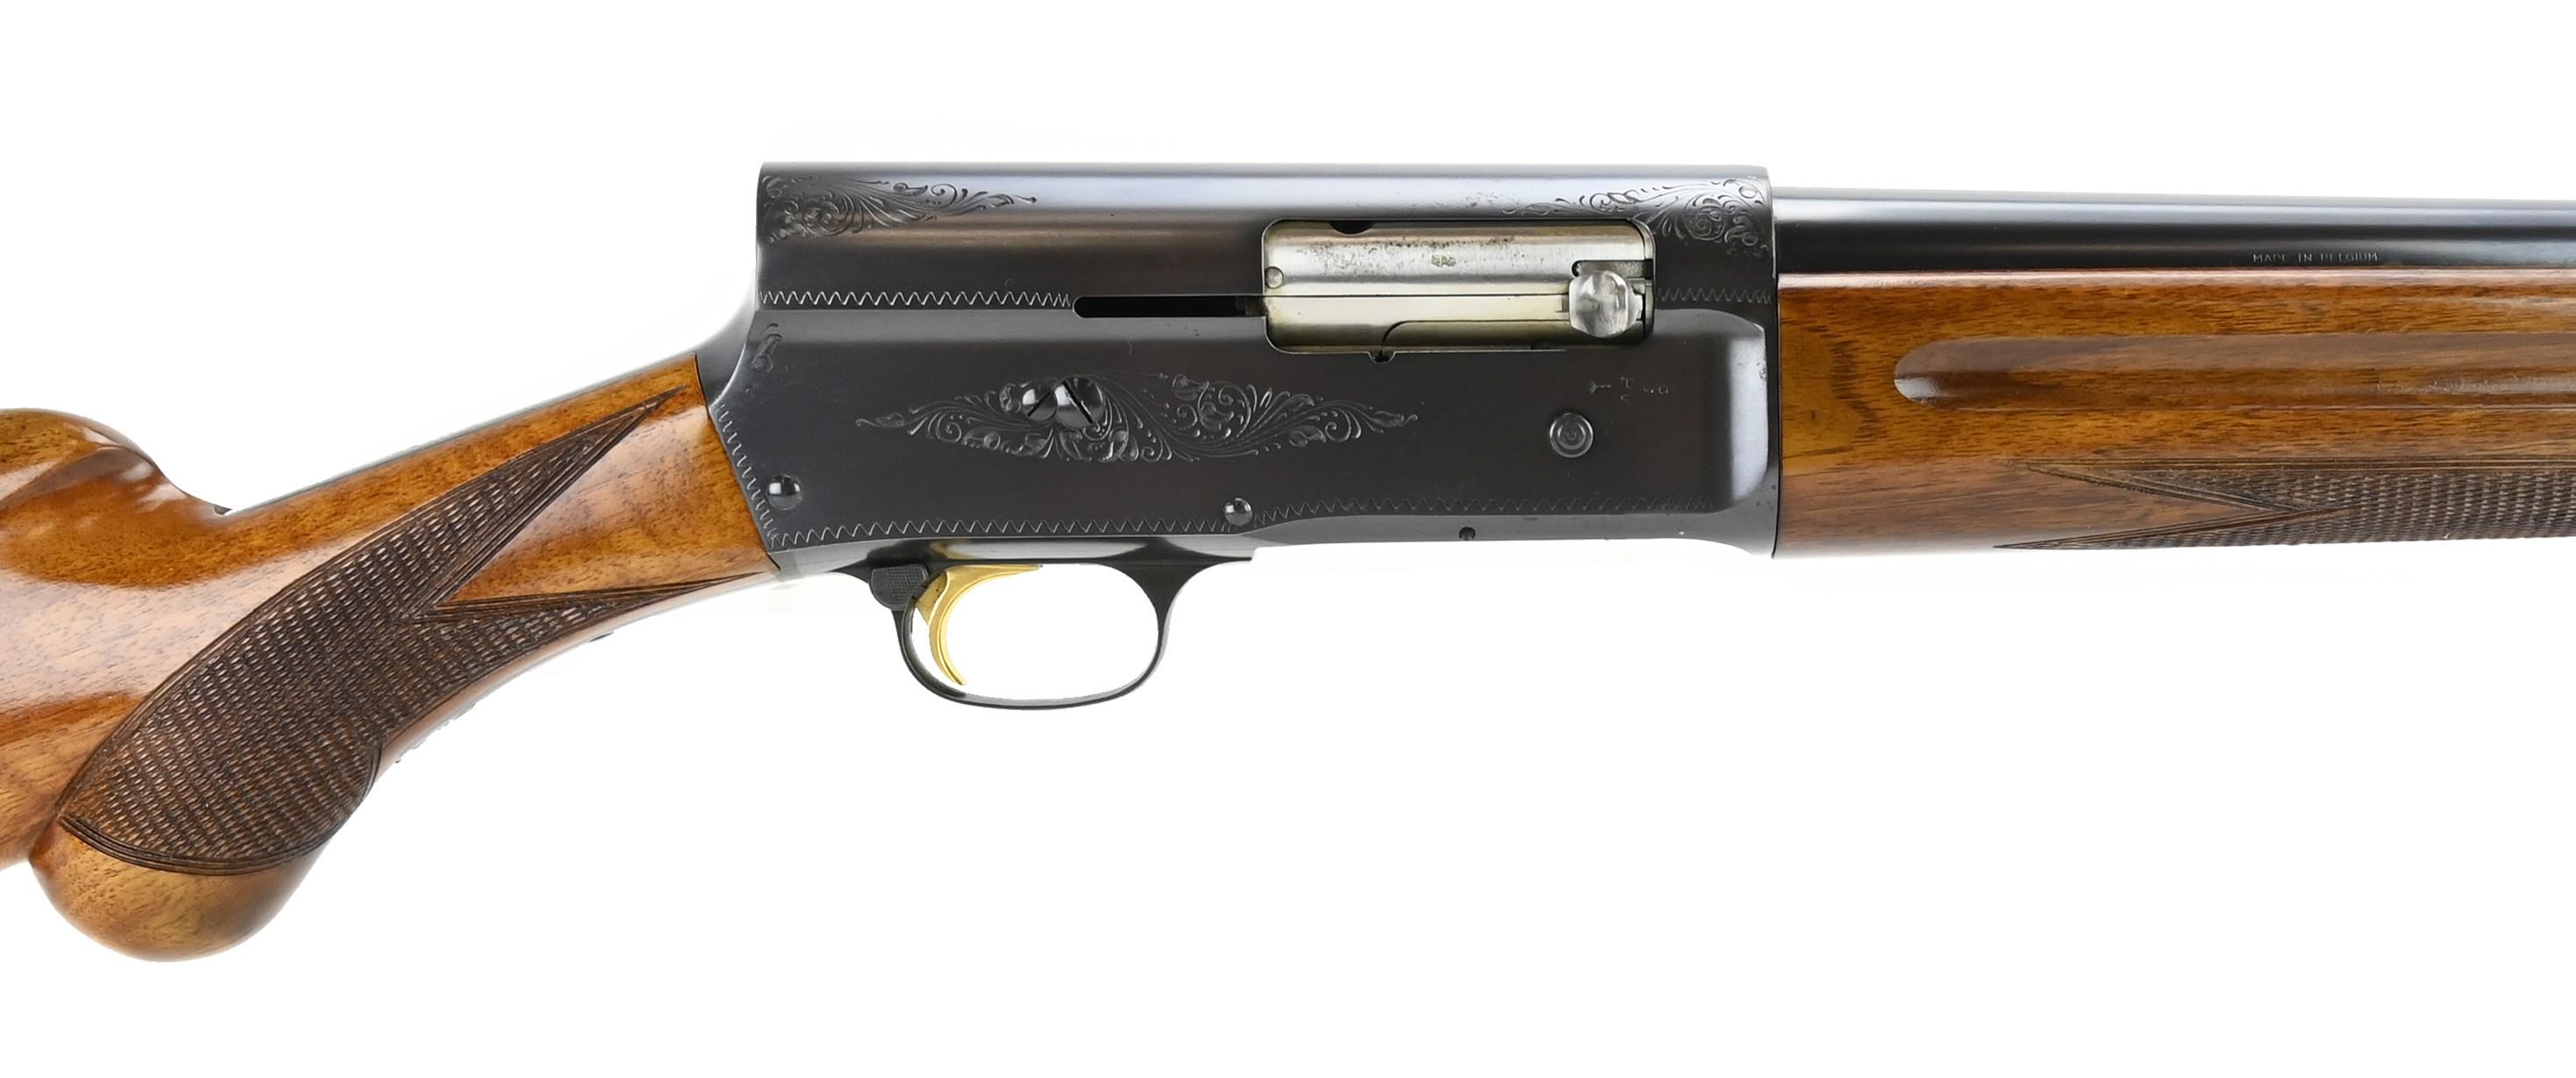 Browning Auto-5 Light Twelve 12 Gauge shotgun for sale.